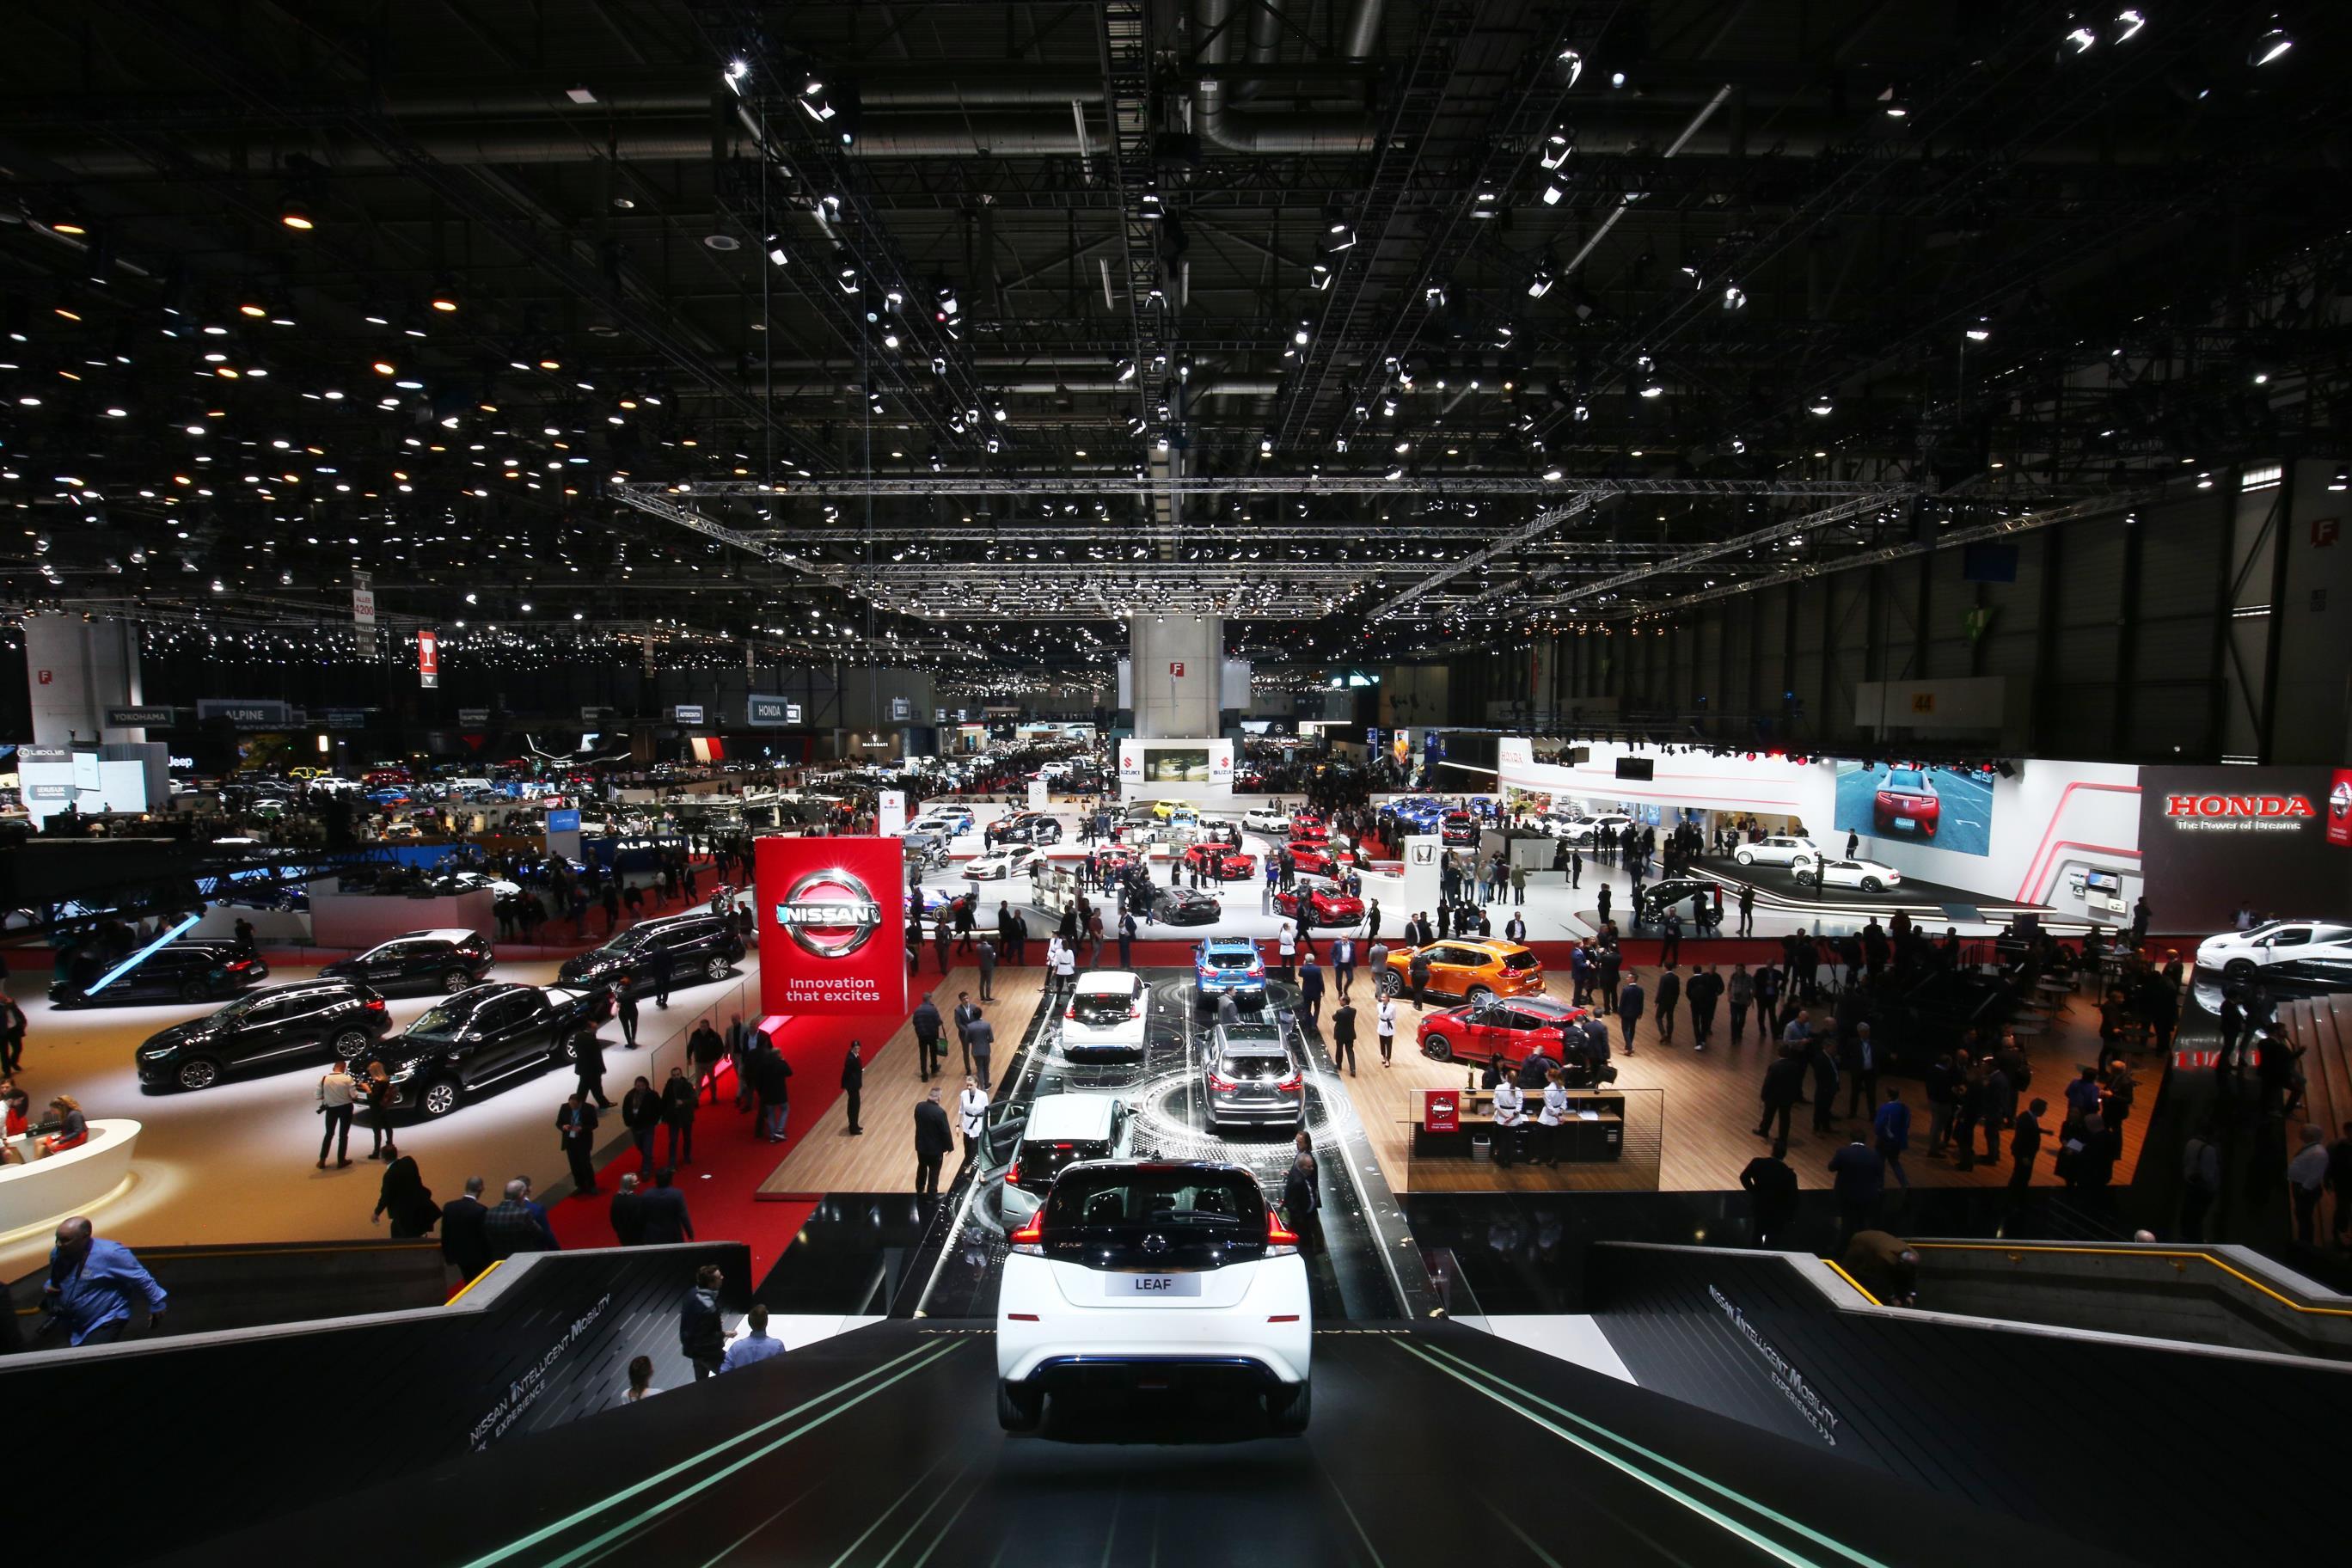 Geneva Motor Show 2018 Mega Gallery Part 1 (331)